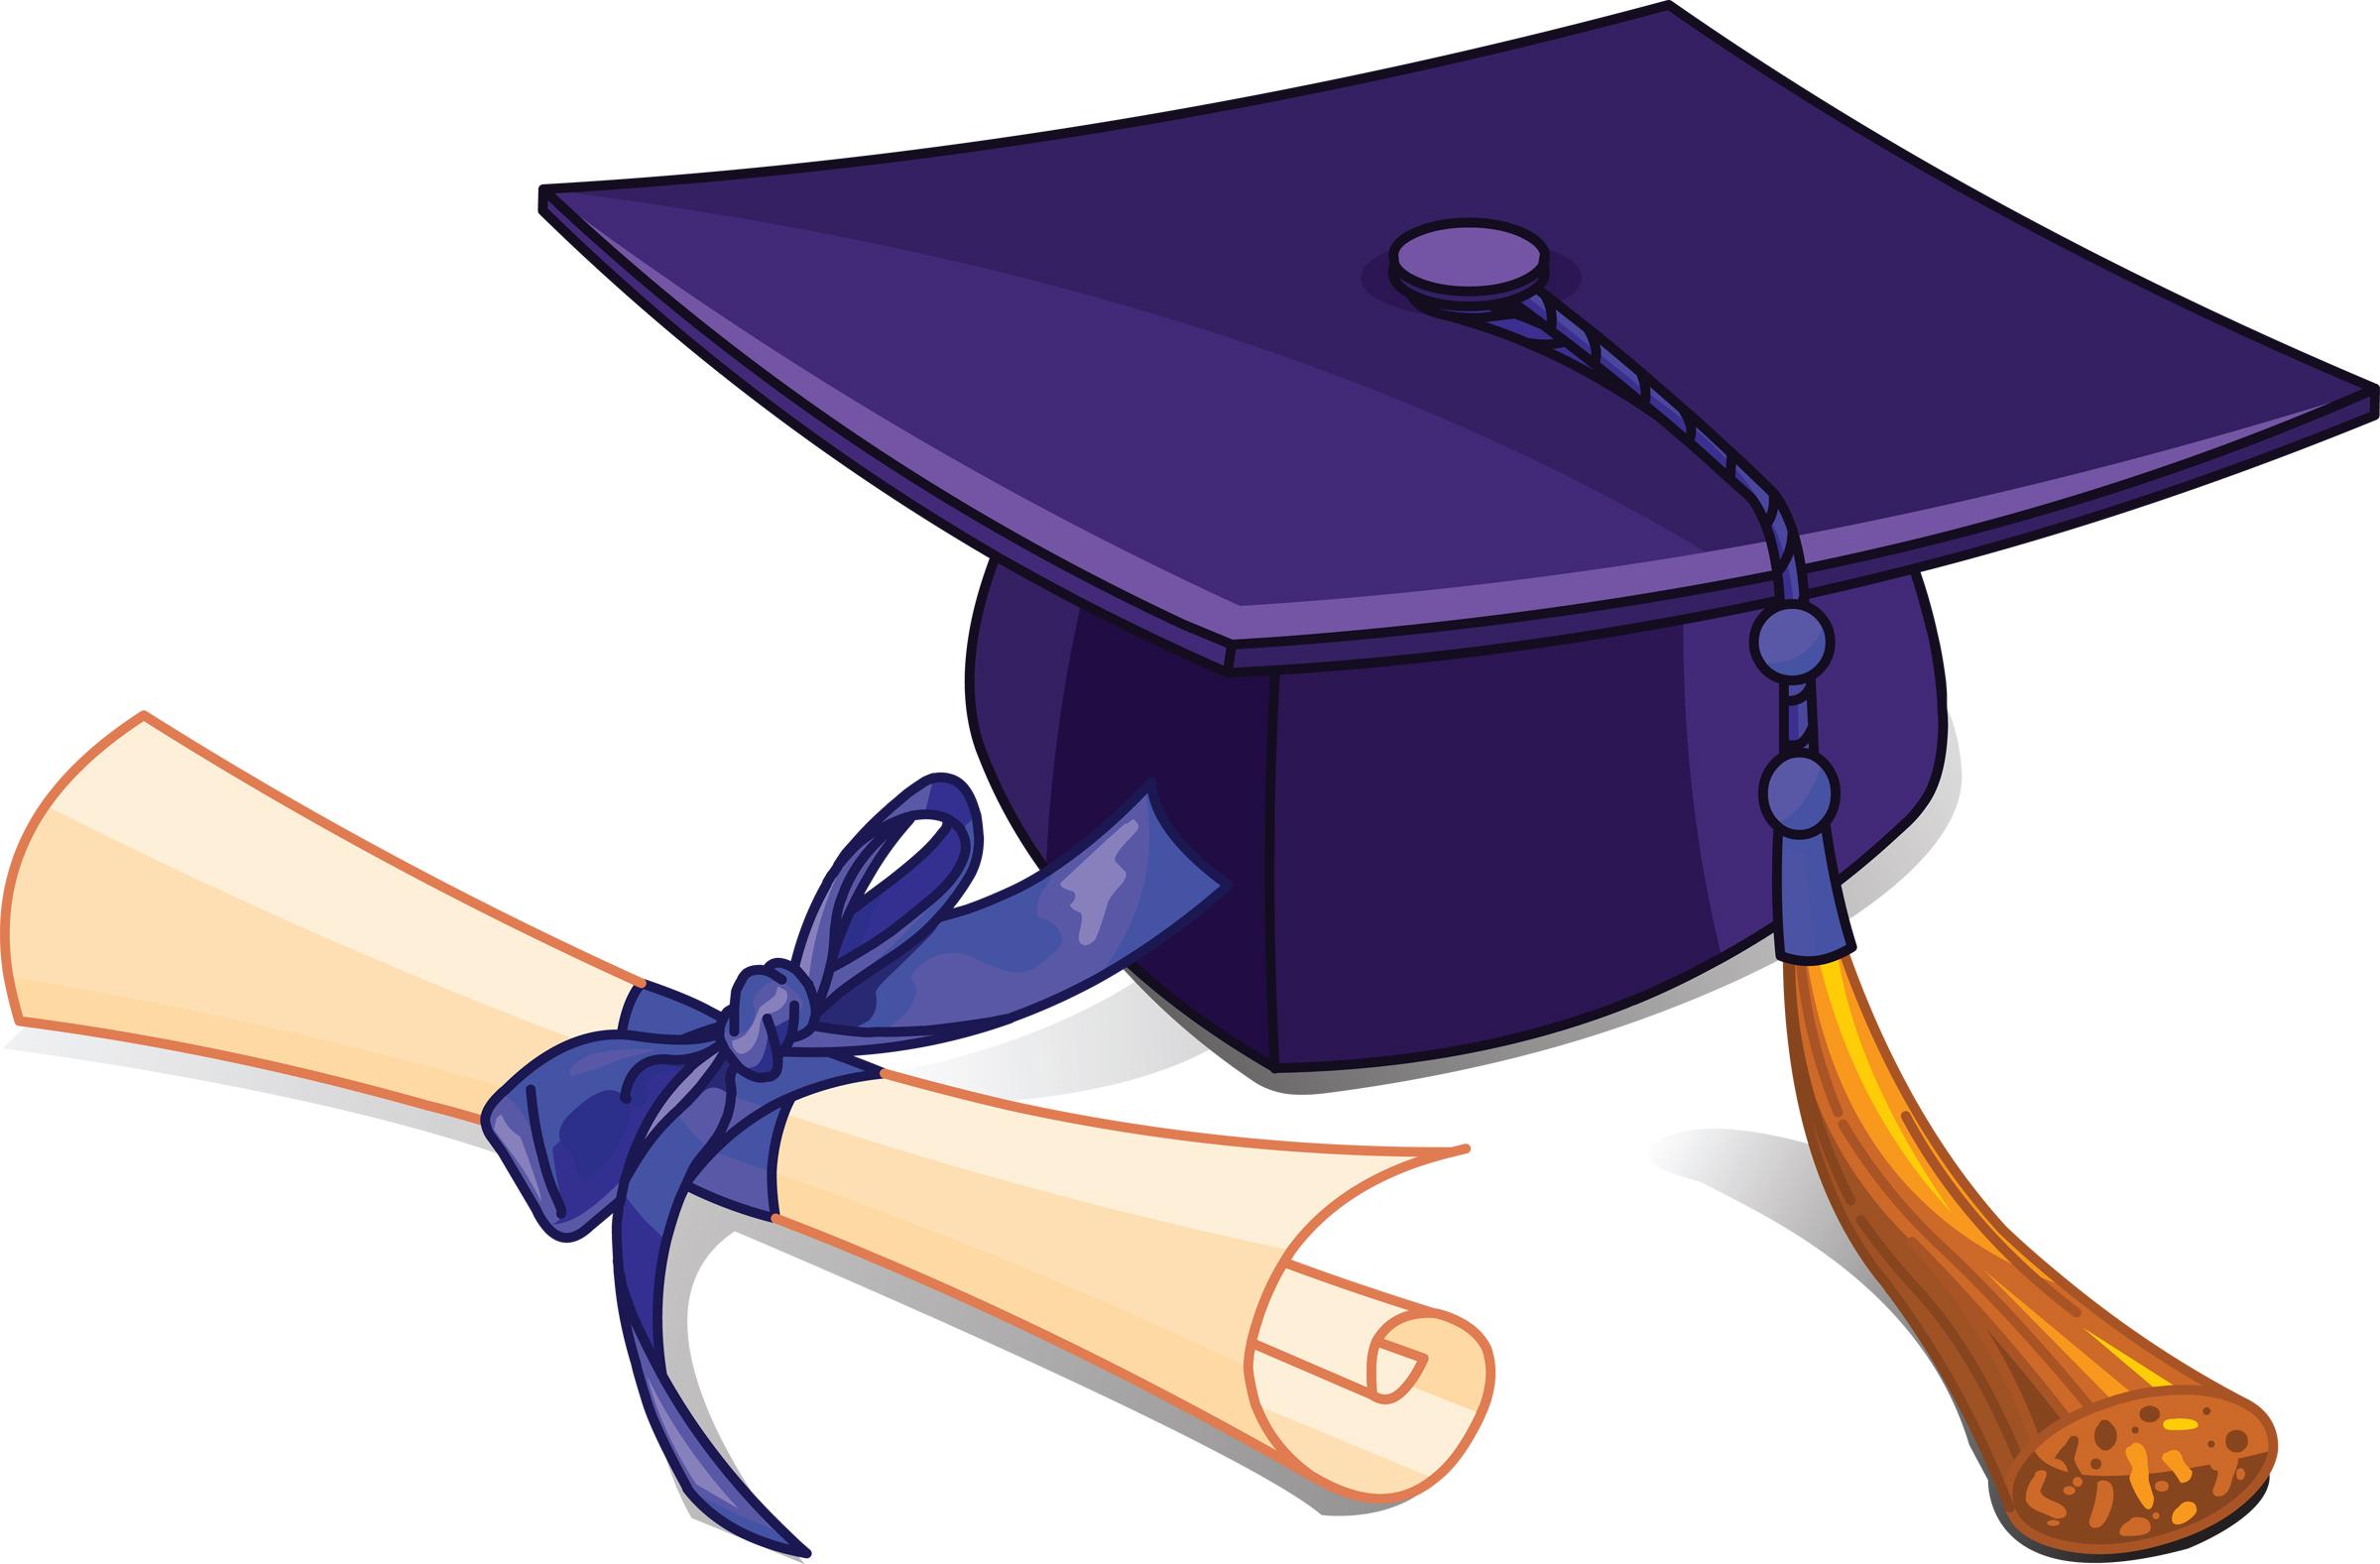 Scholarship awards clip art. Diploma clipart post secondary